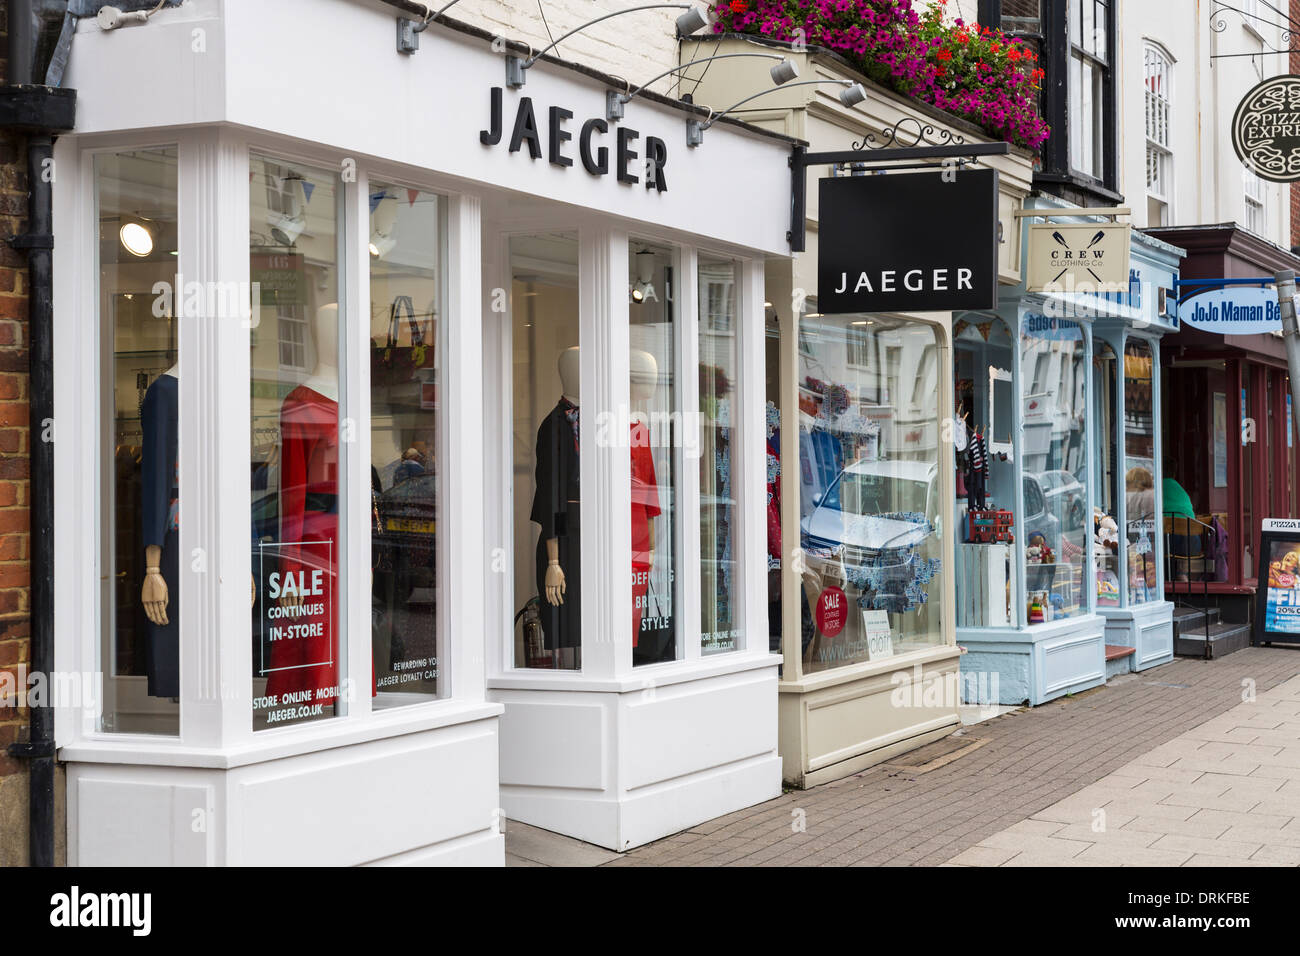 Jaeger fashion shop window Stock Photo - Alamy